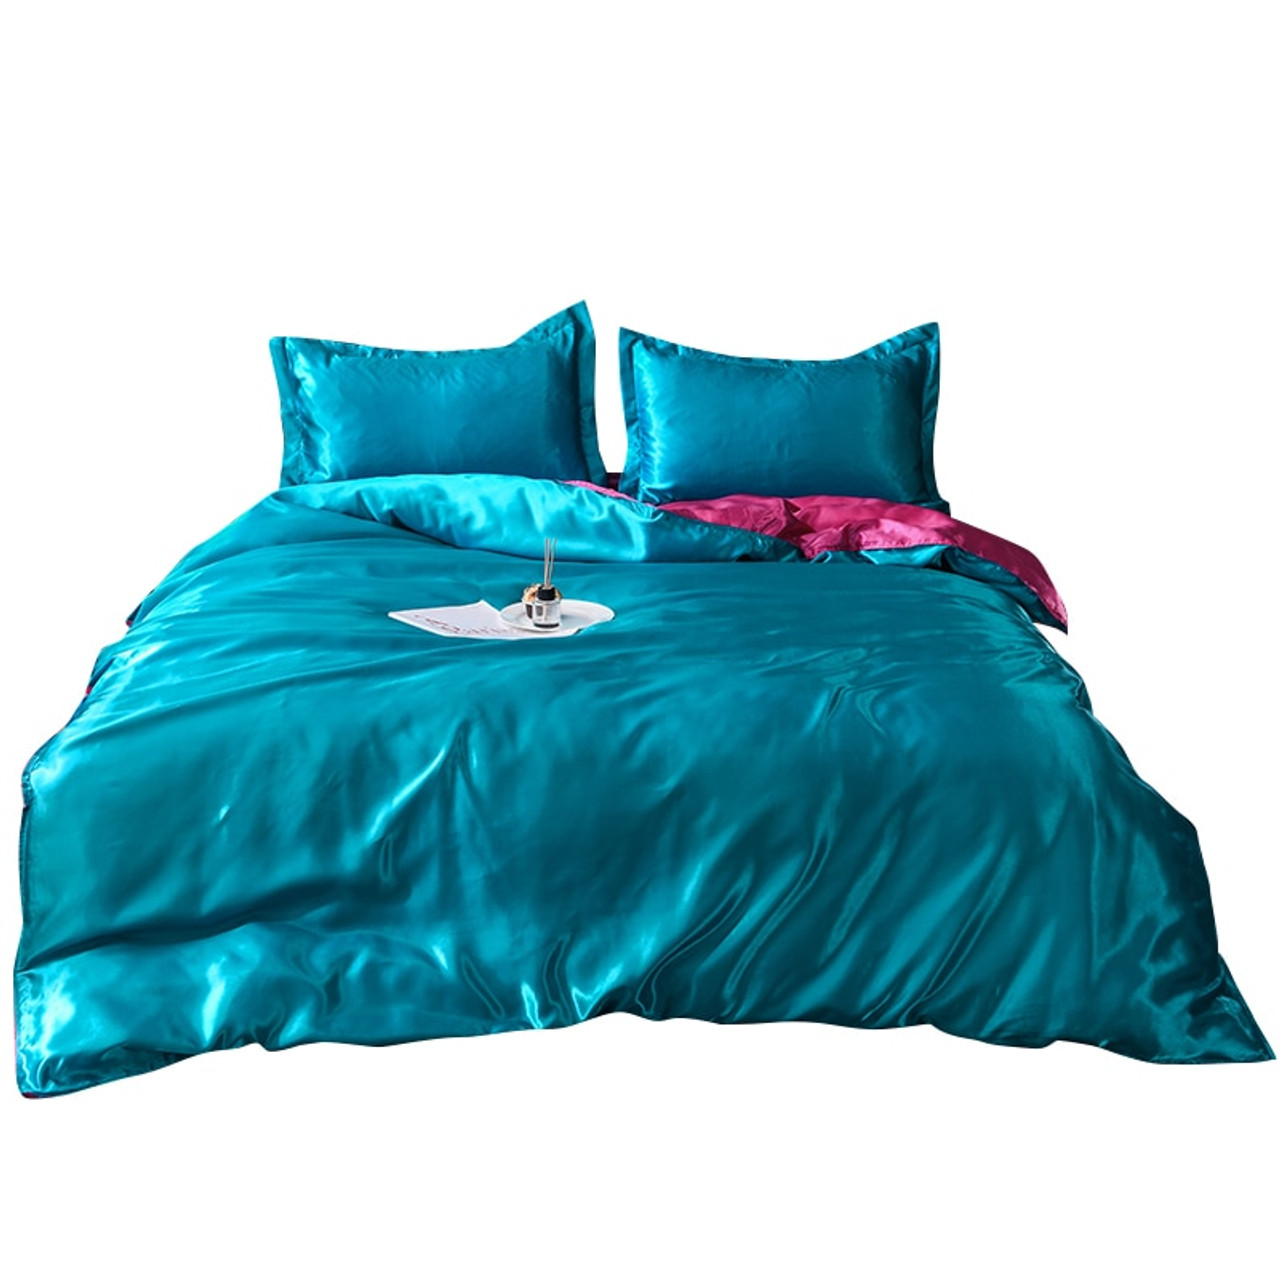 100 Pure Satin Silk Bedding Set Home Textile King Size Bed Set Bedclothes Purple Duvet Cover Flat Sheet Pillowcases Wholesale Onshopdeals Com